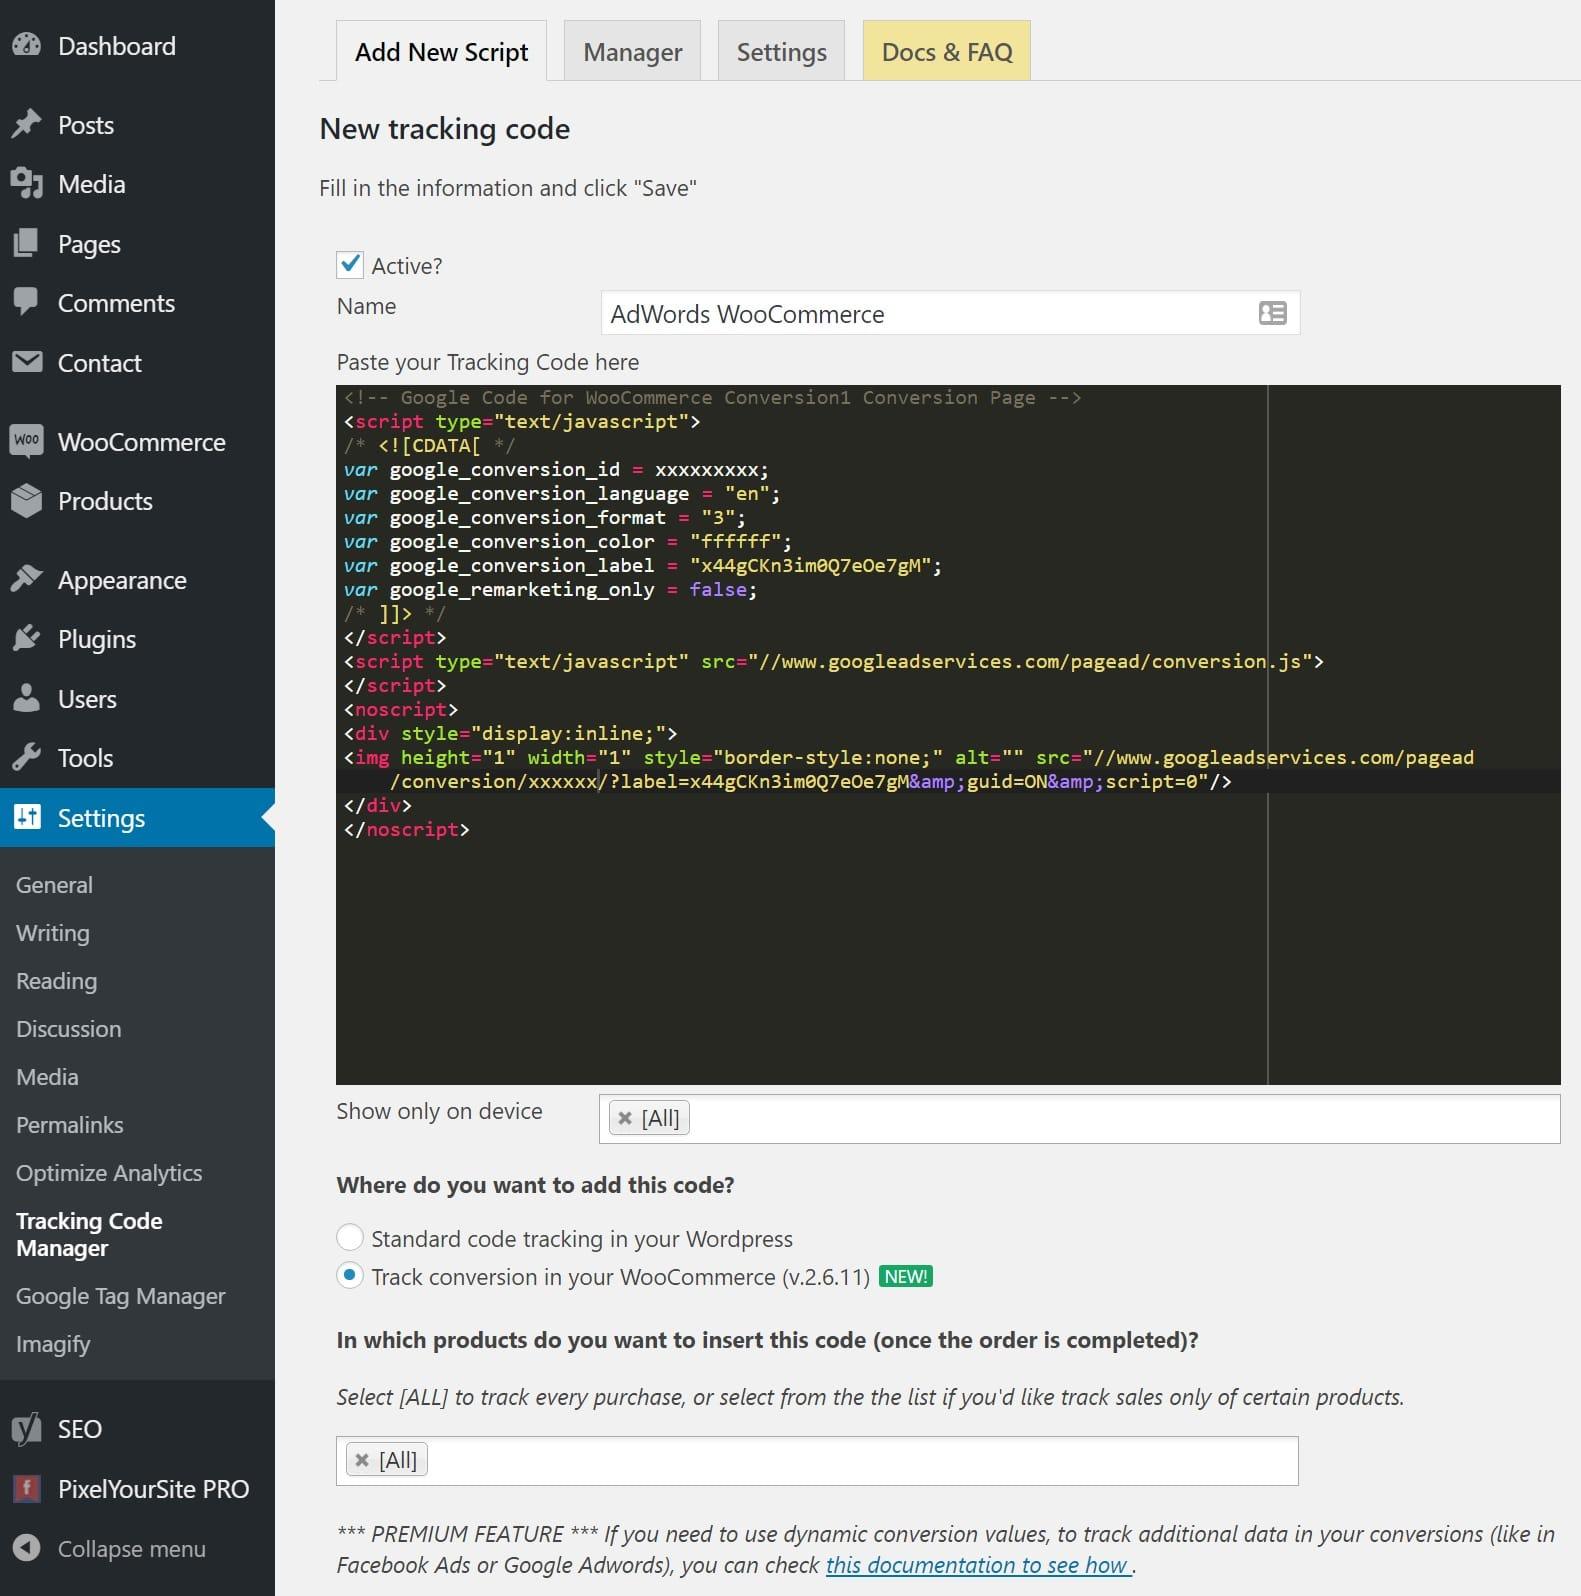 AdWordsのWooCommerceピクセルを追加する